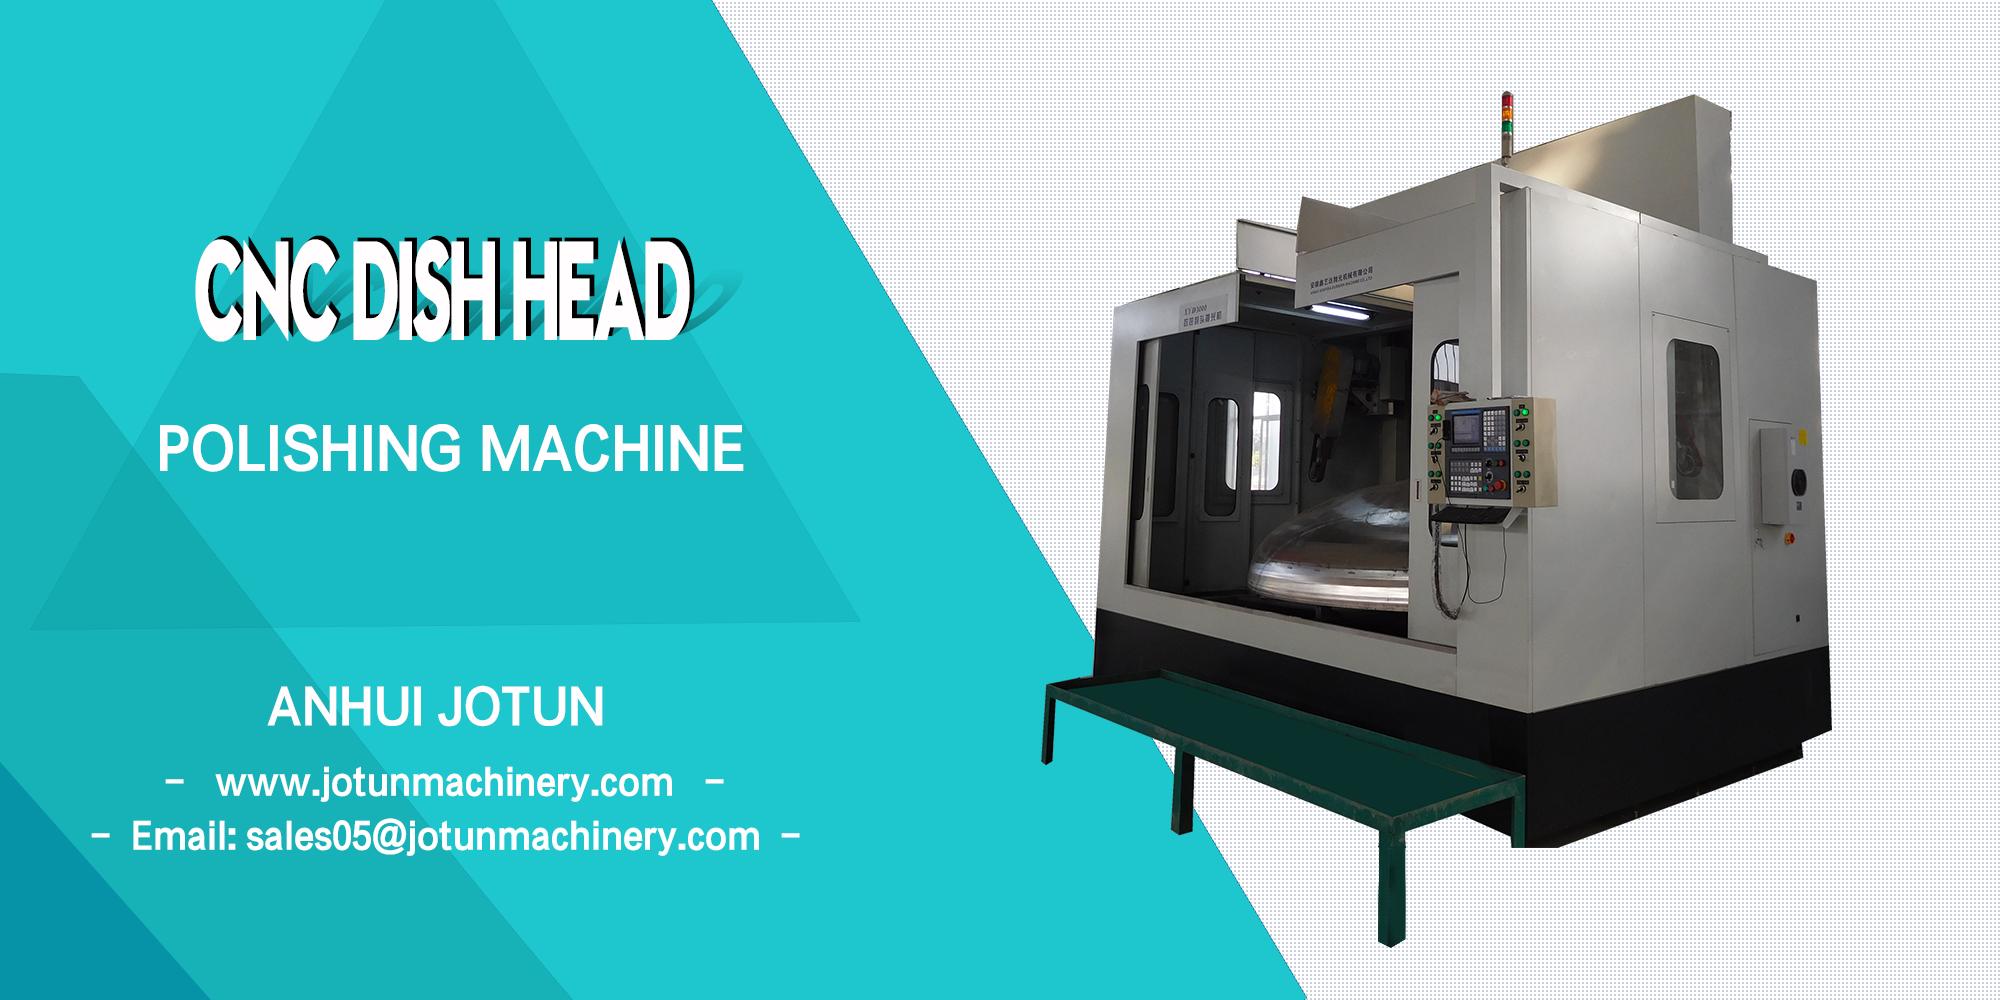 CNCdishheadpolishingmachine polisher grinding buffing